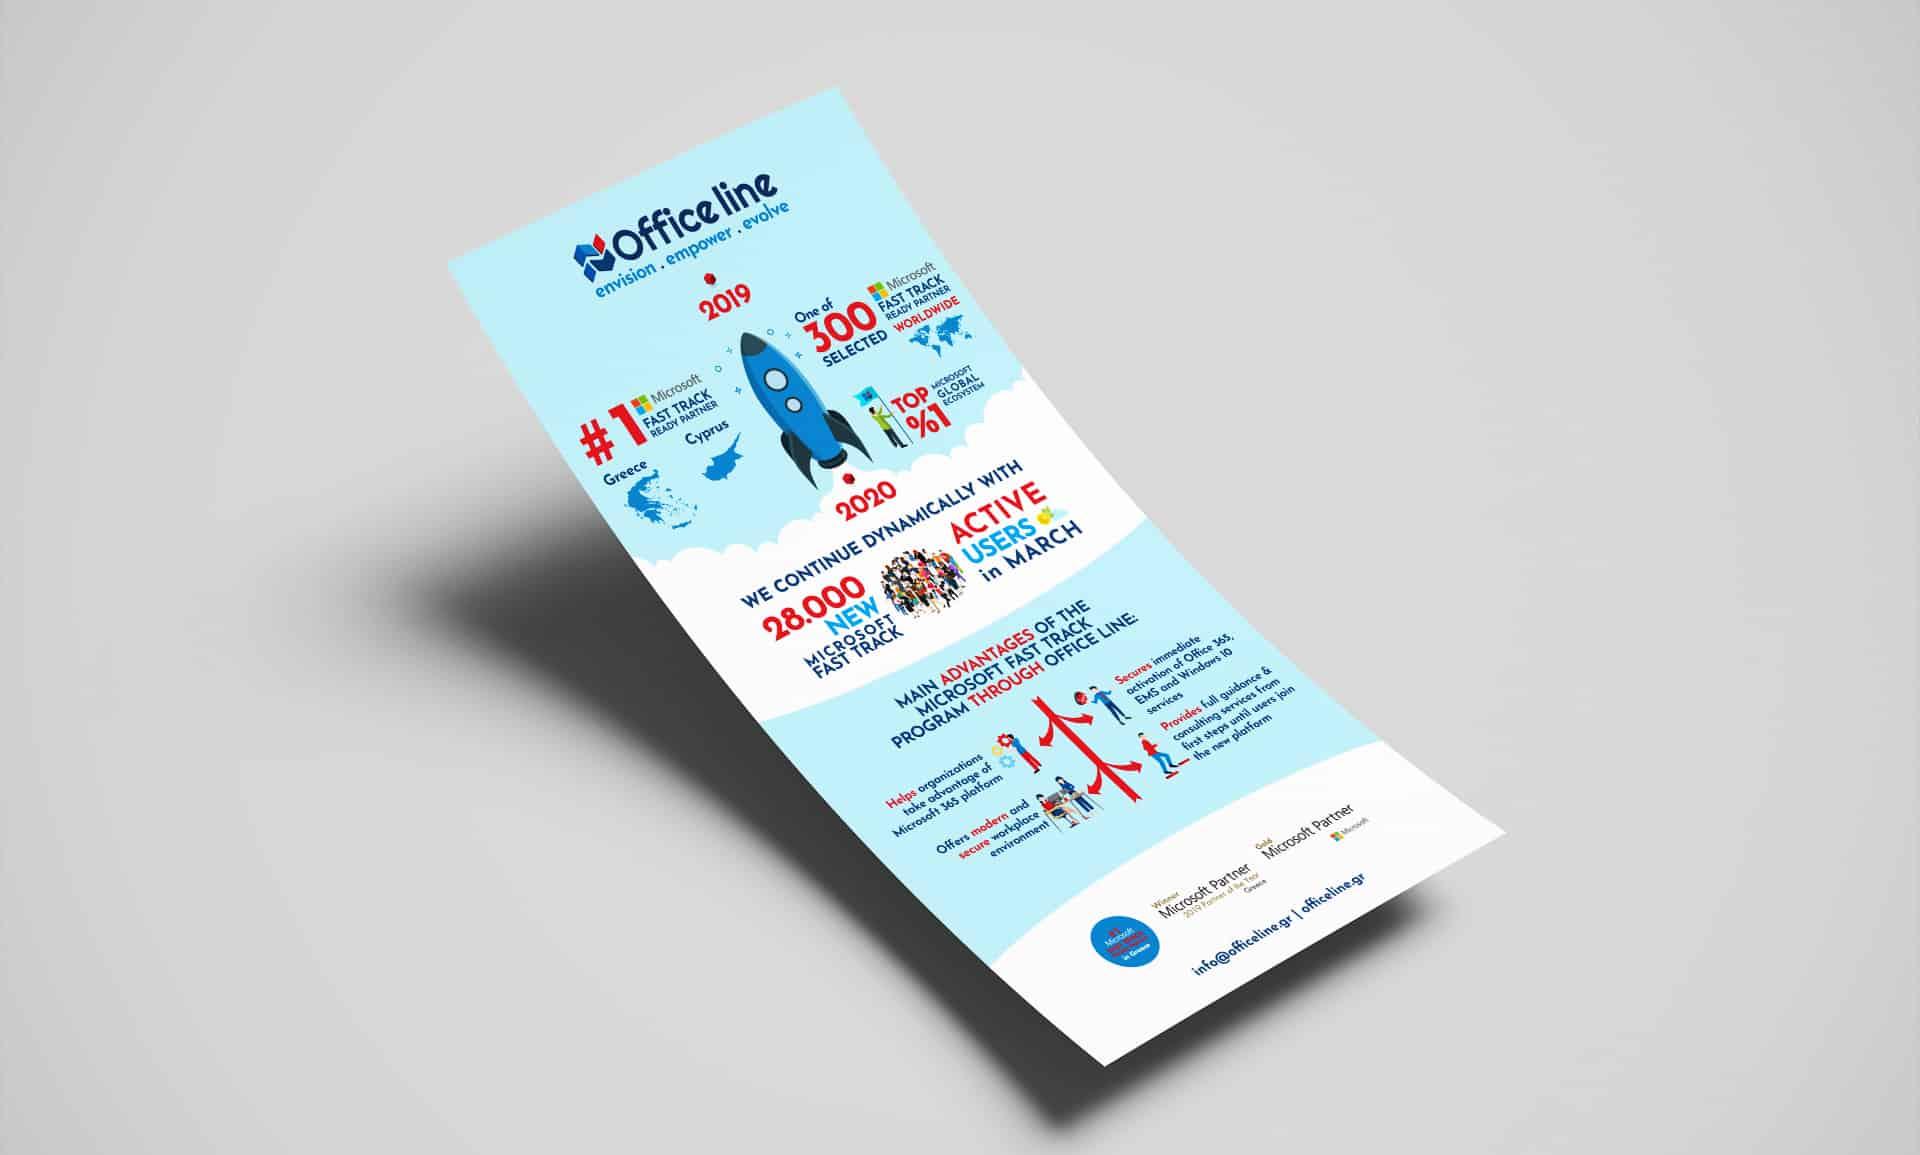 PROPAGANDA - infographic officeline